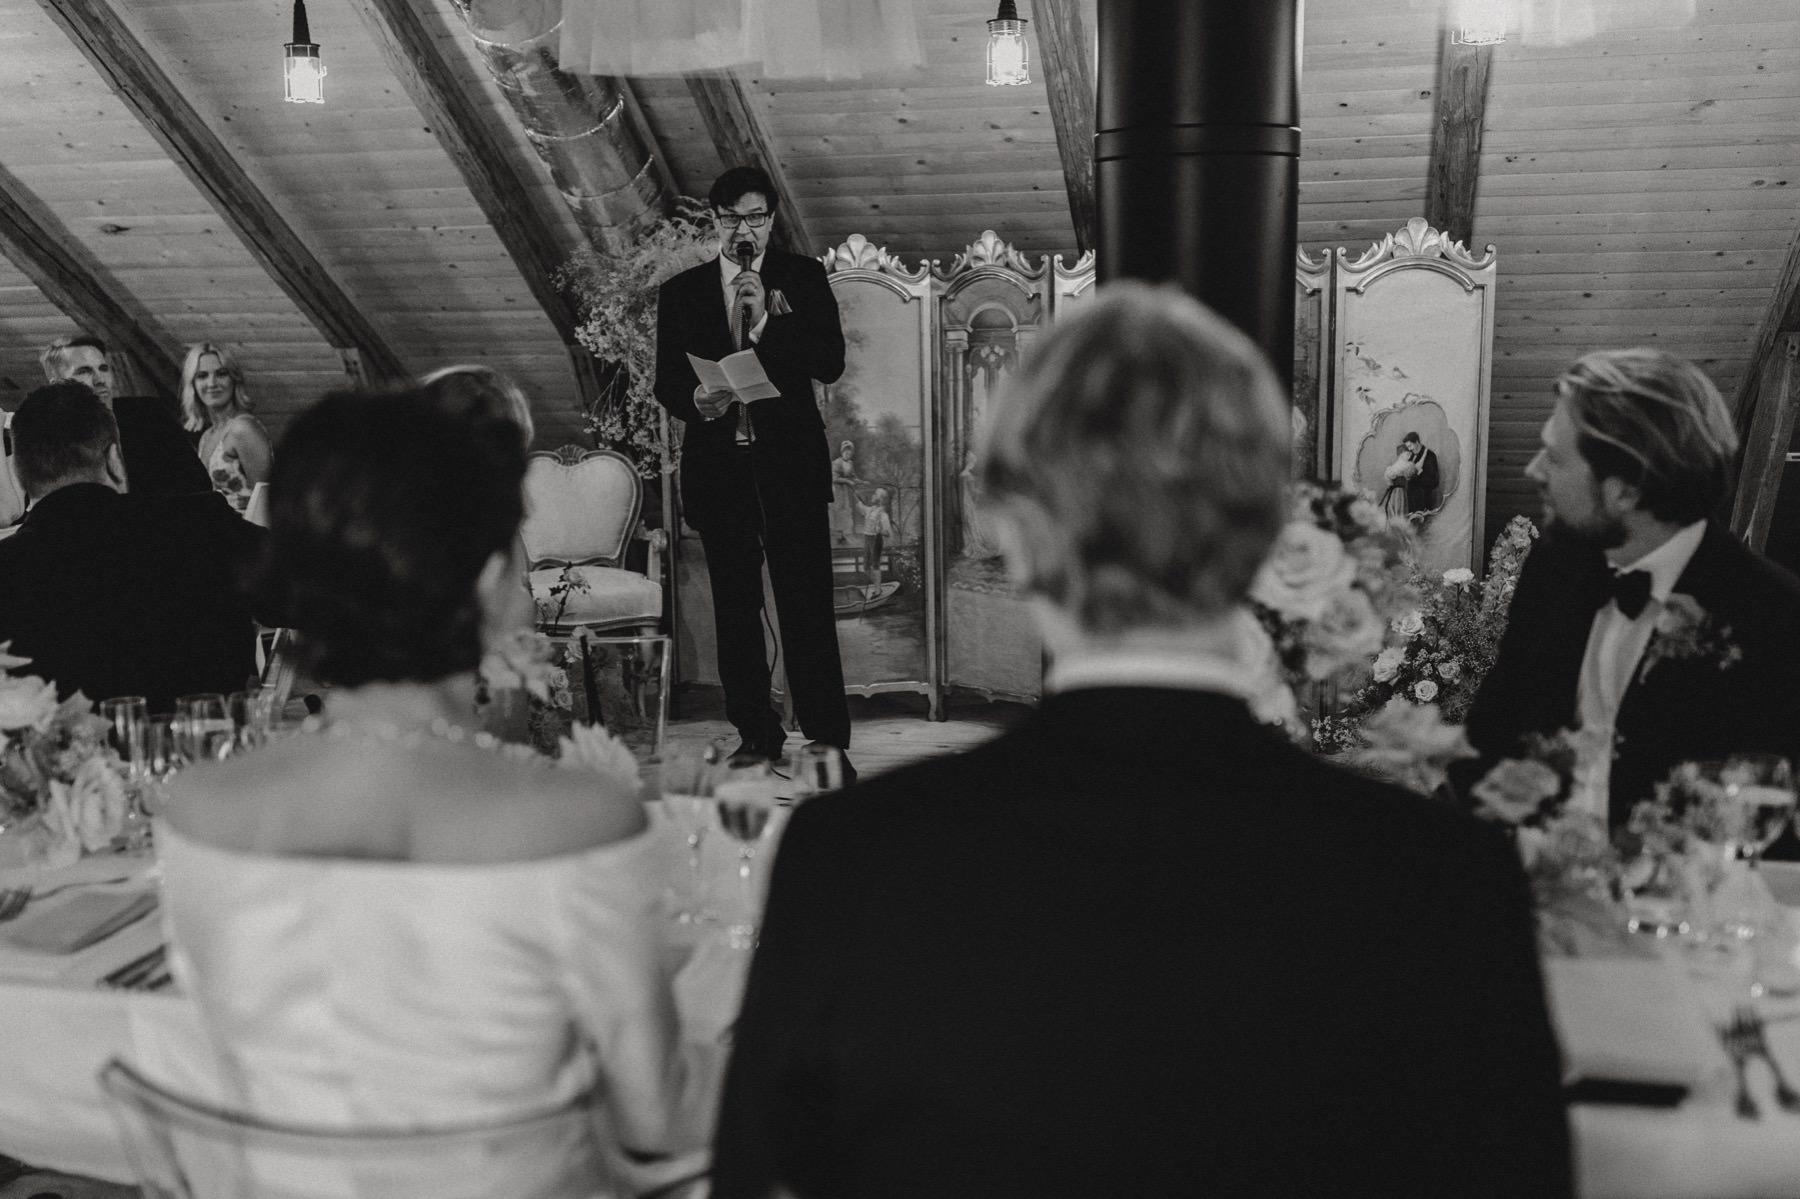 wedding in a private barn